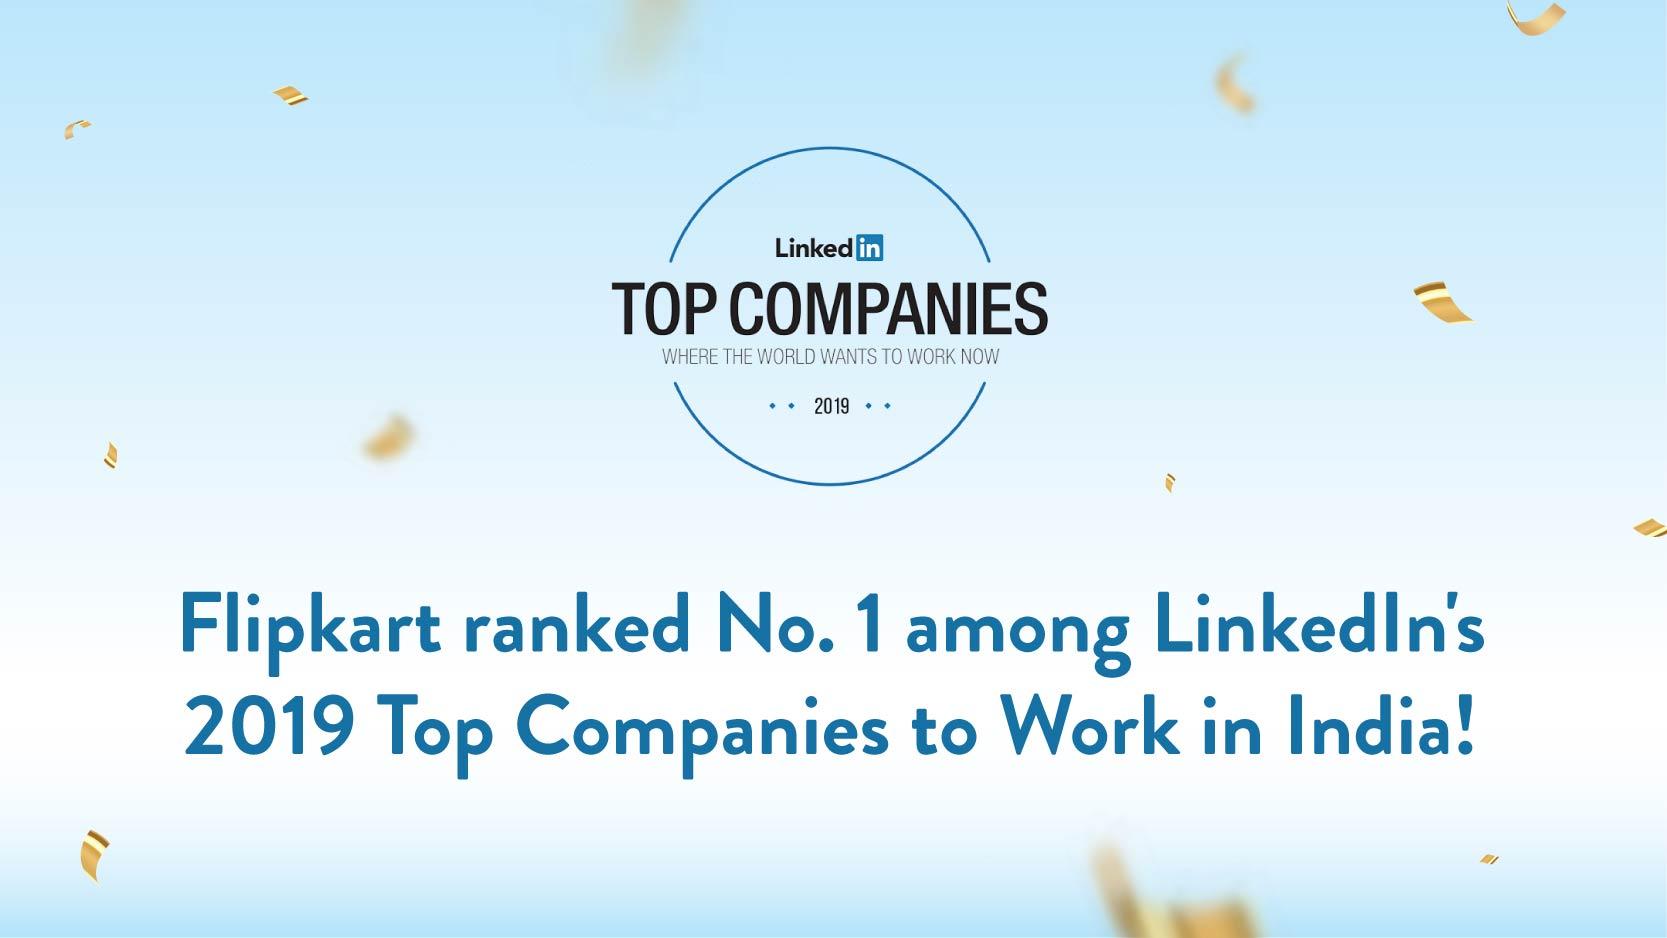 Flipkart ranked No. 1 among LinkedIn Top Companies 2019!